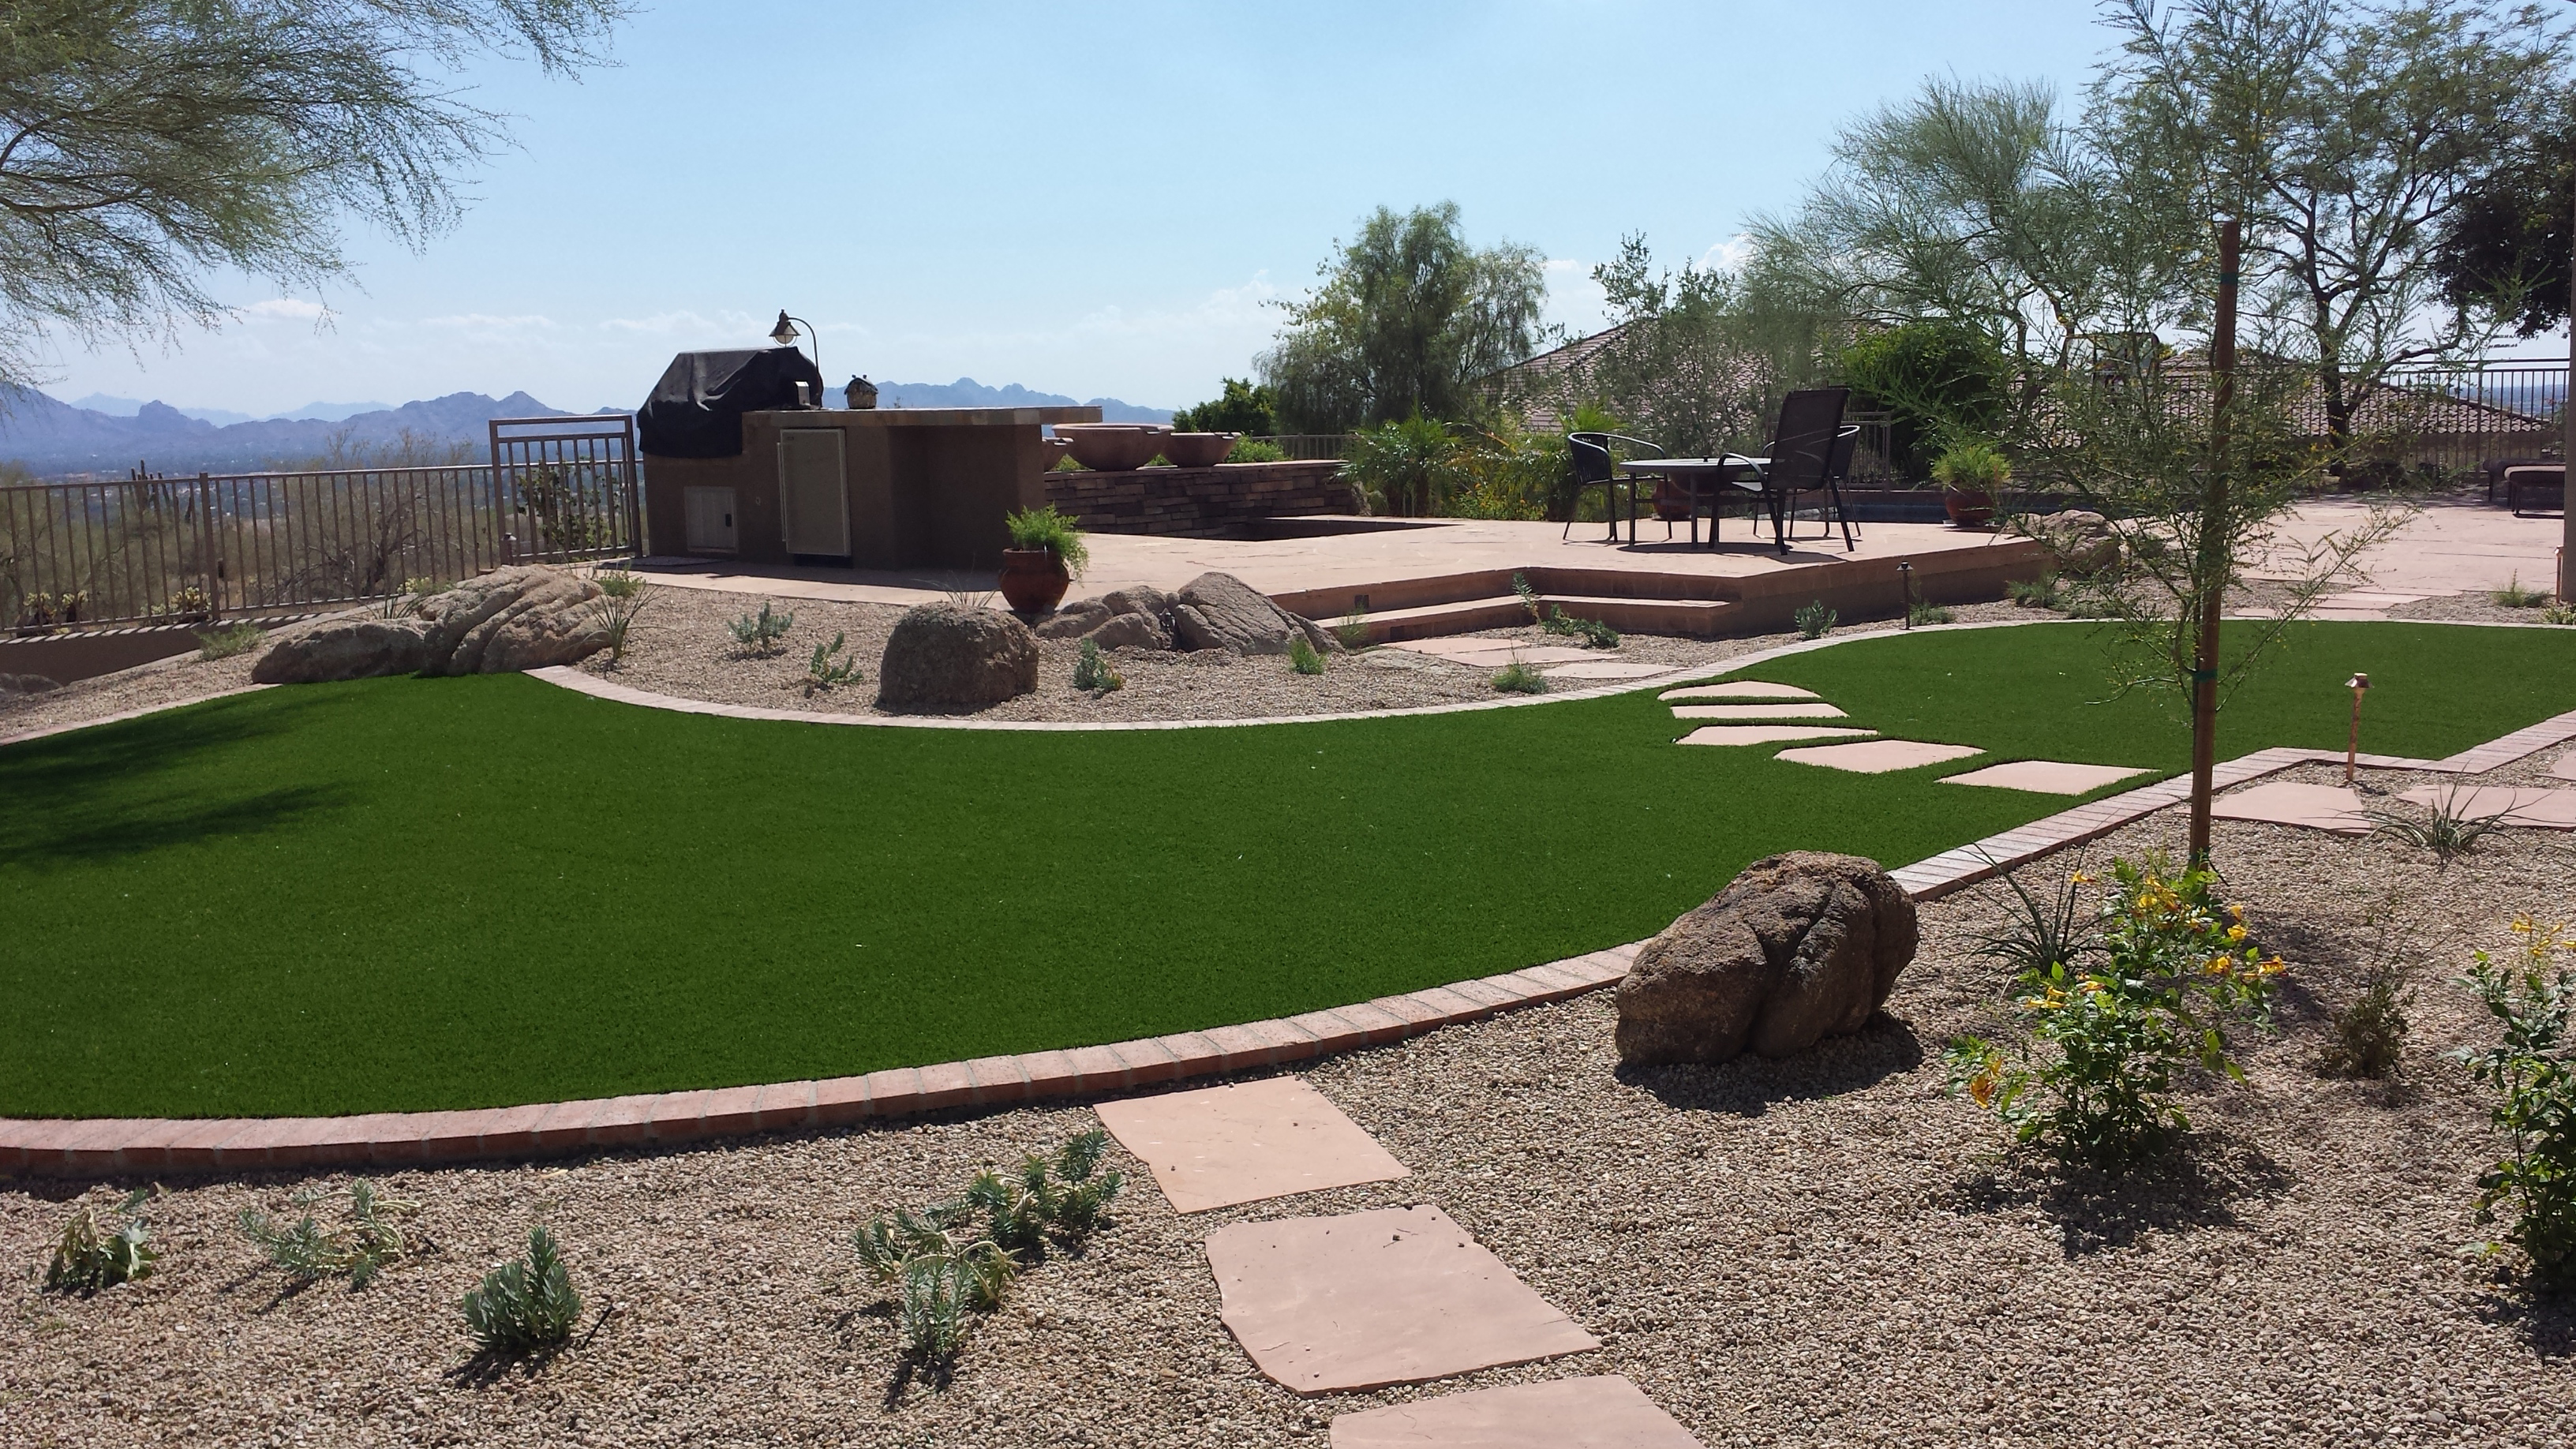 Desert Yard Landscape - Turf or Grass